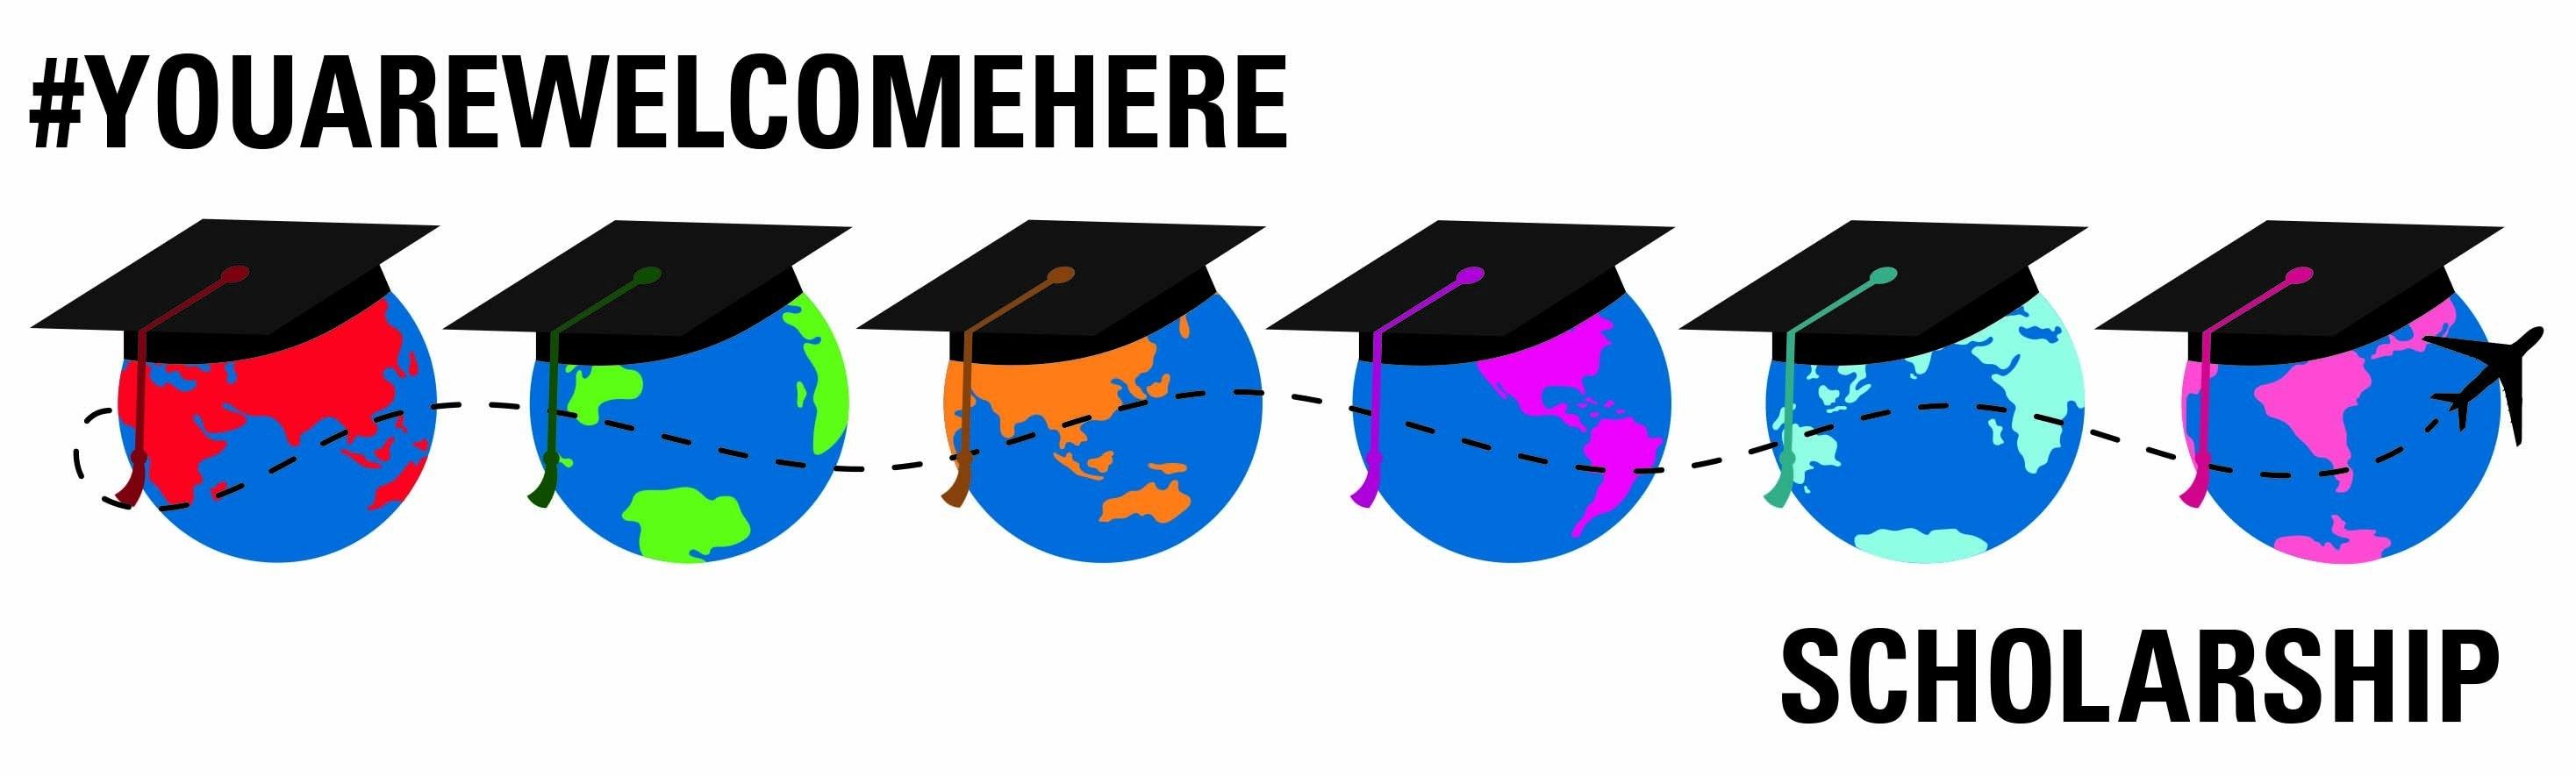 Youarewelcomehere Scholarship - First-Year - International Students Seattle U Calendar 2019